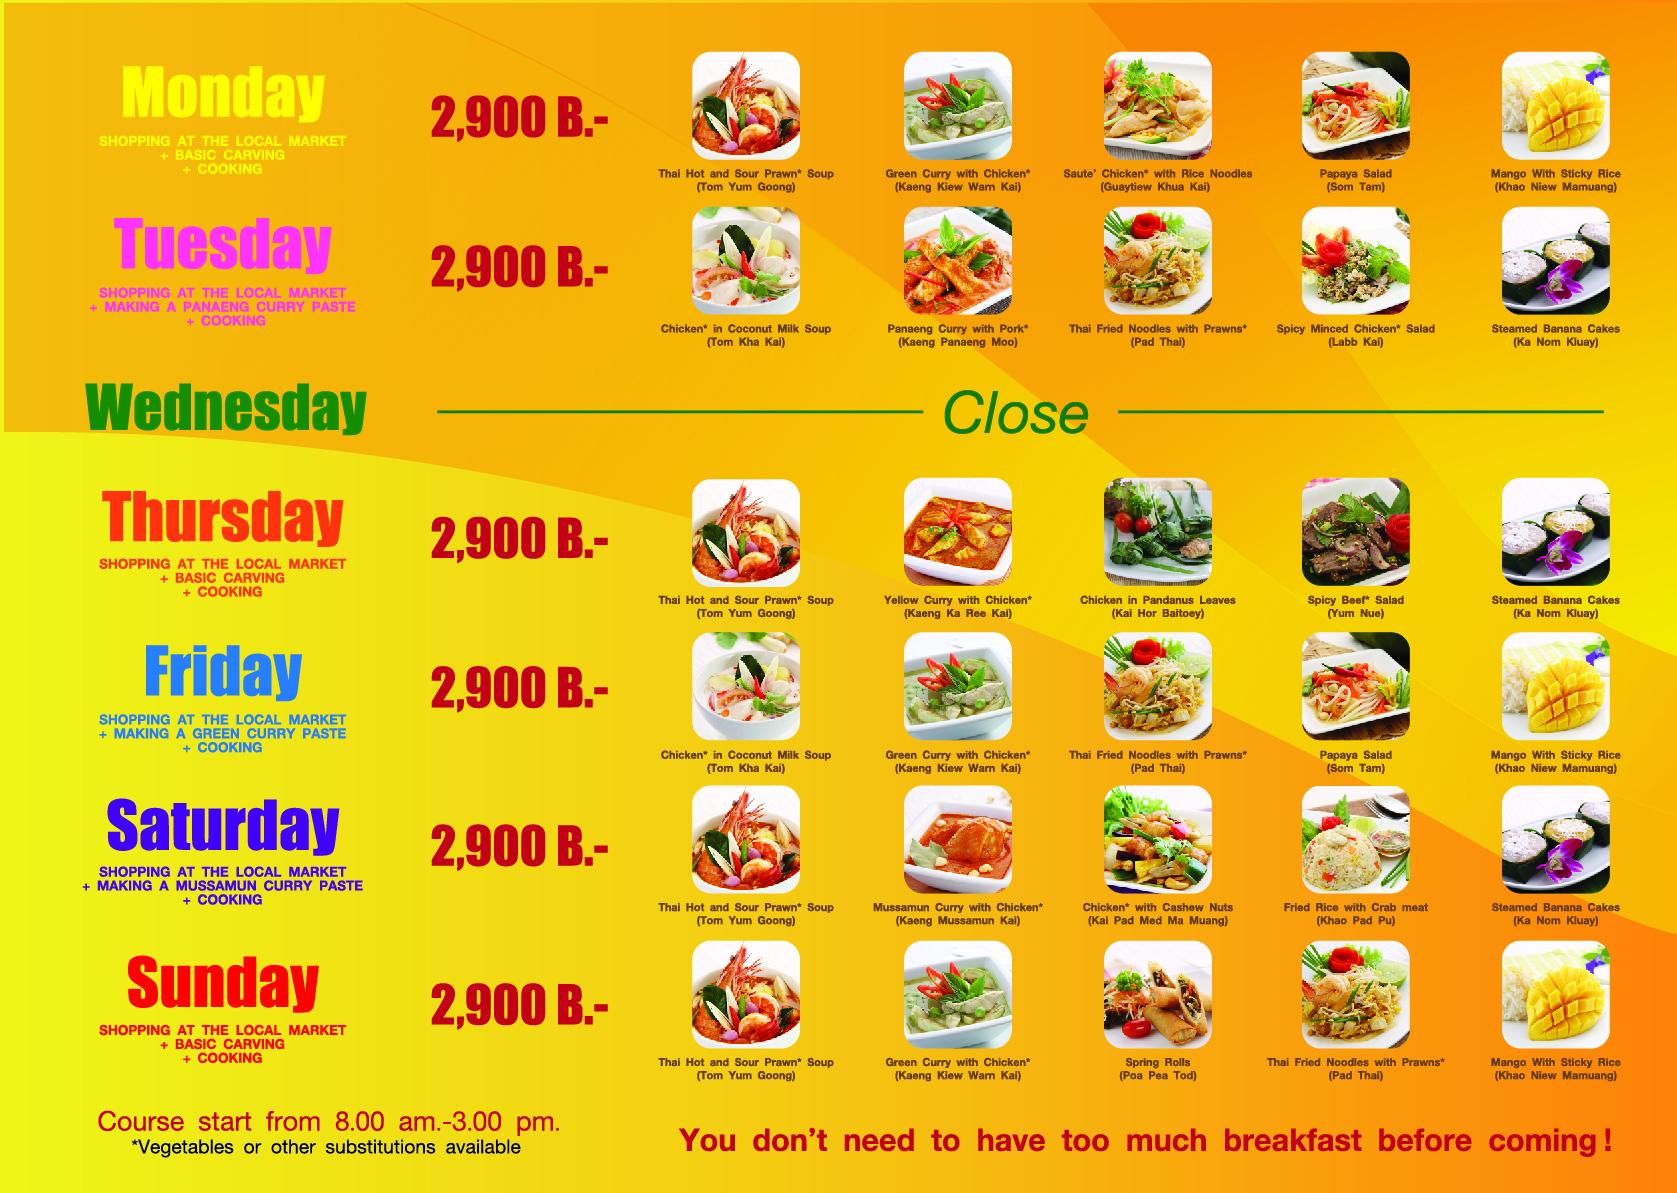 Phuket Thai Cookery brochure